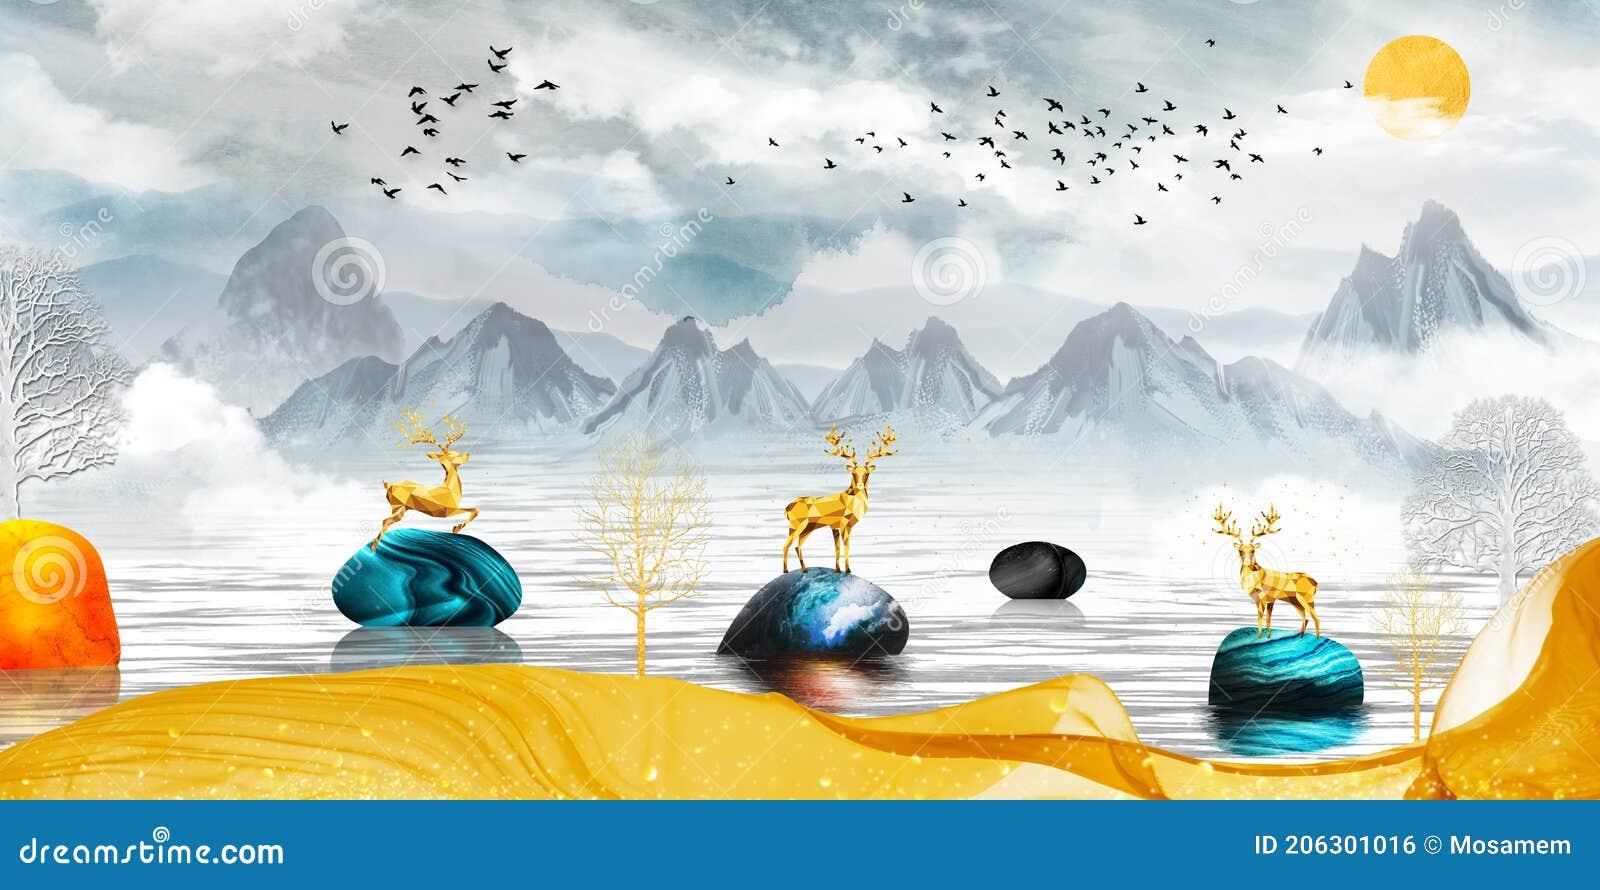 3d Modern Canvas Art Mural Wallpaper Landscape Lake Background Golden Deer Christmas Tree Gray Mountain Sun With Clouds An Stock Illustration Illustration Of Decoration Landscape 206301016